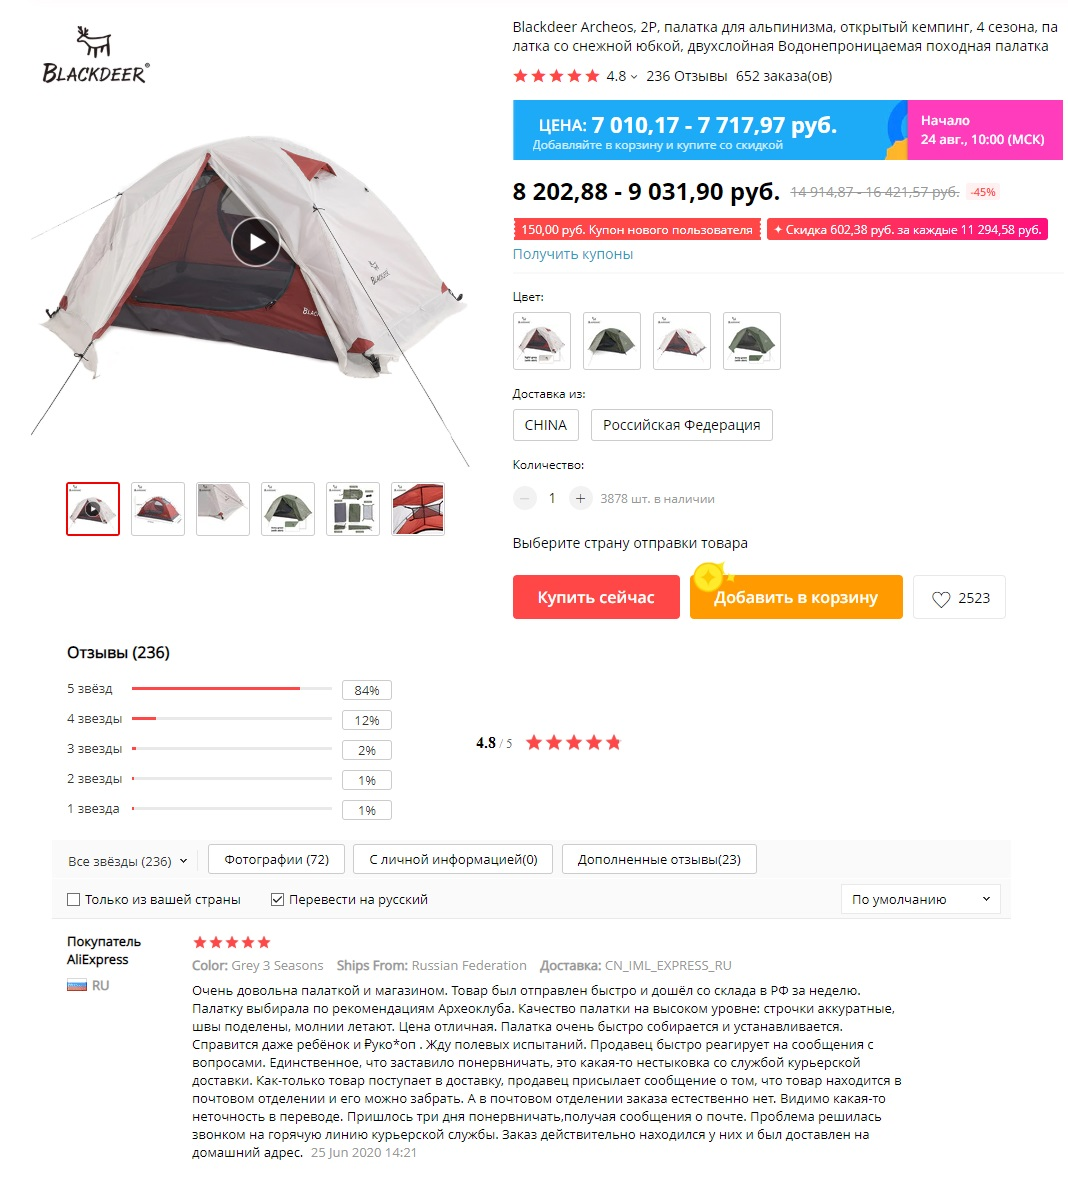 Палатка Blackdeer Archeos